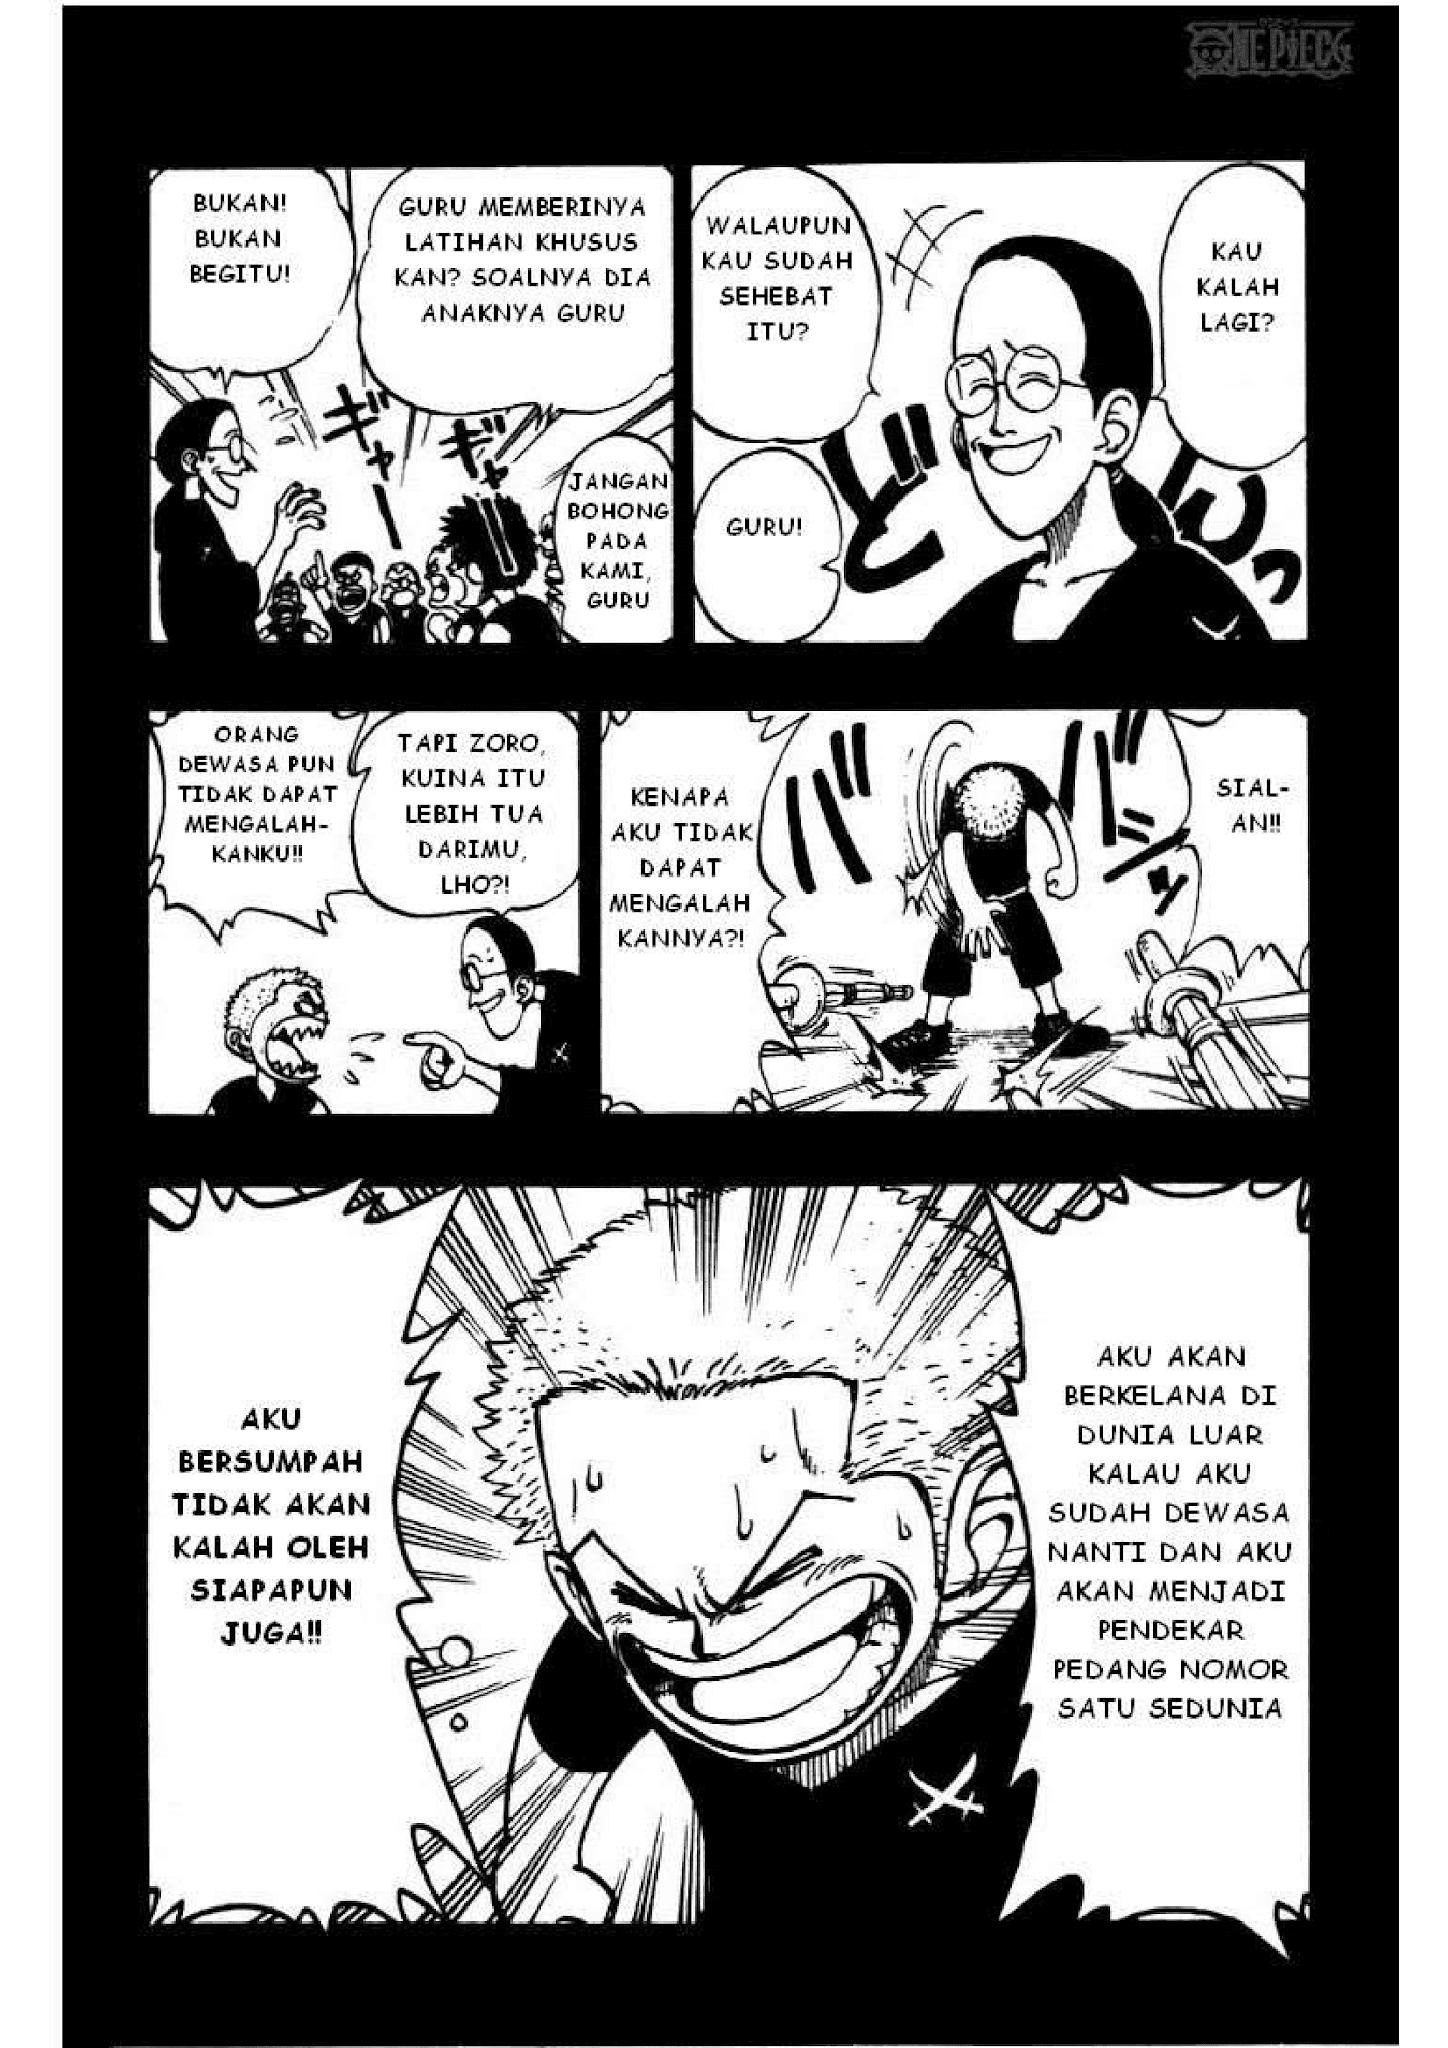 Manga One Piece Chapter 0005 Bahasa Indonesia